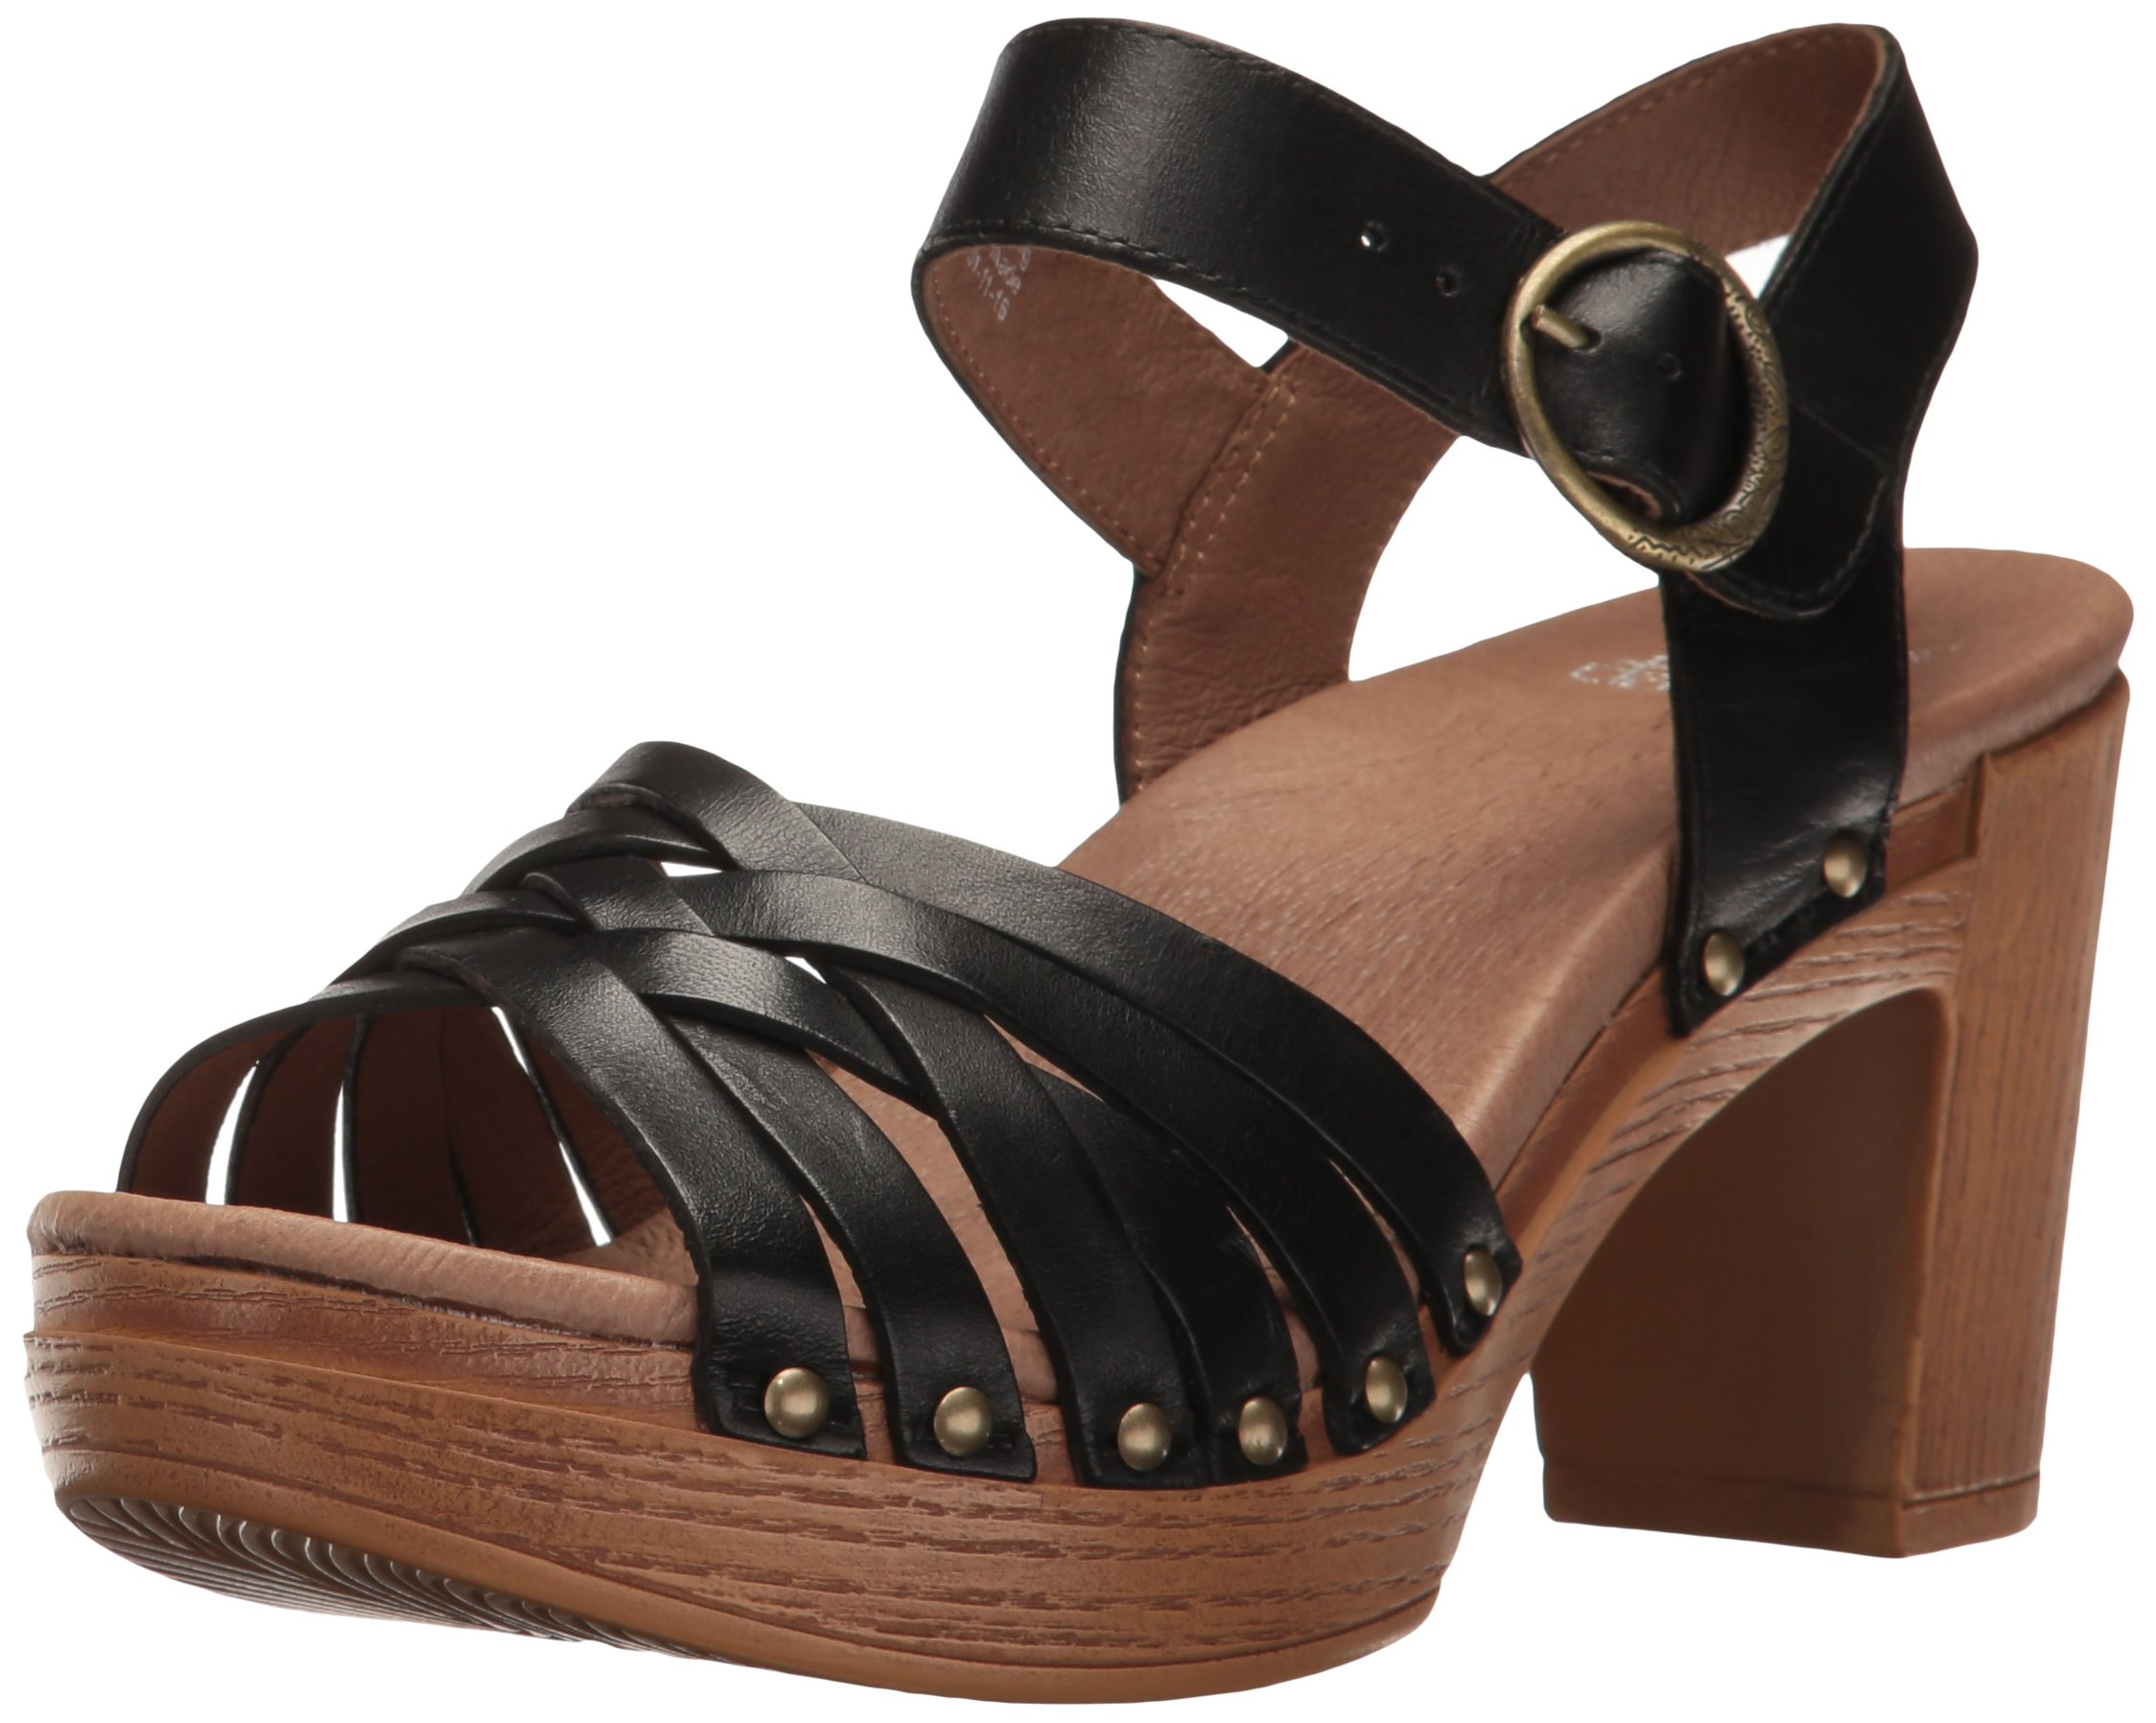 Dansko Women's Dawson Heeled Sandal, Black Full Grain, 36 EU/5.5-6 M US